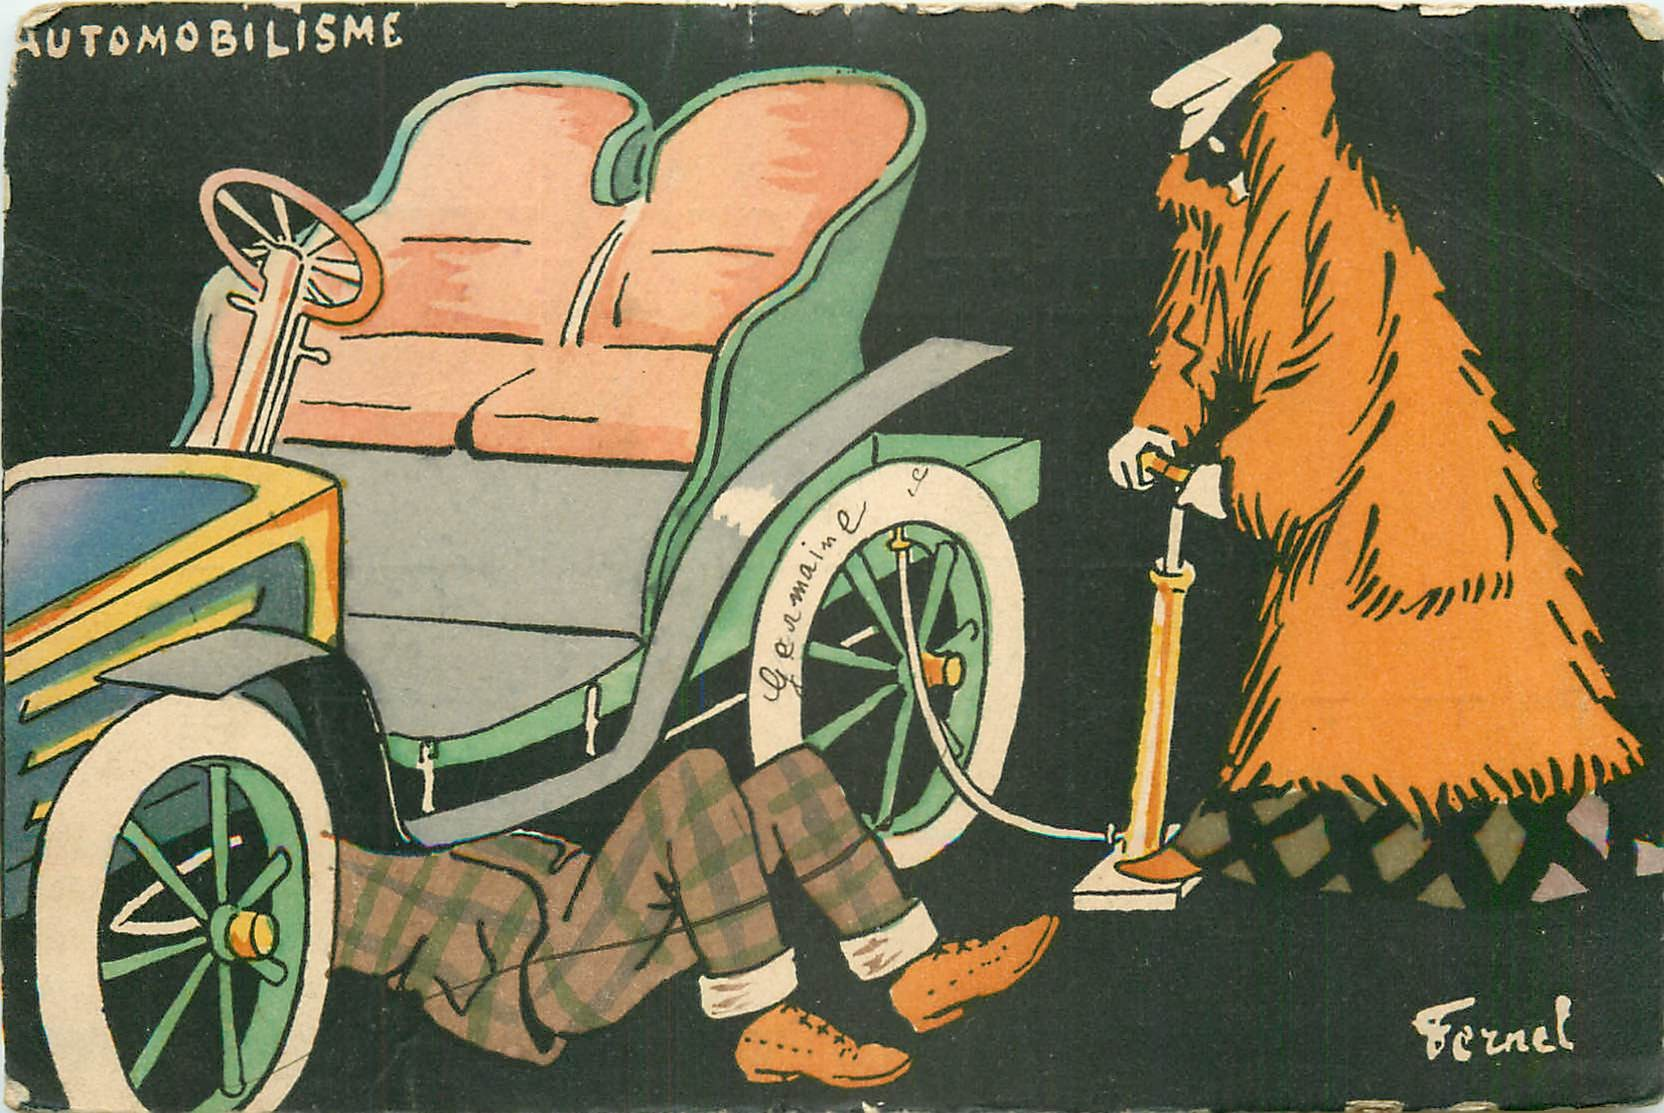 Illustrateur FERNEL. Automobilisme